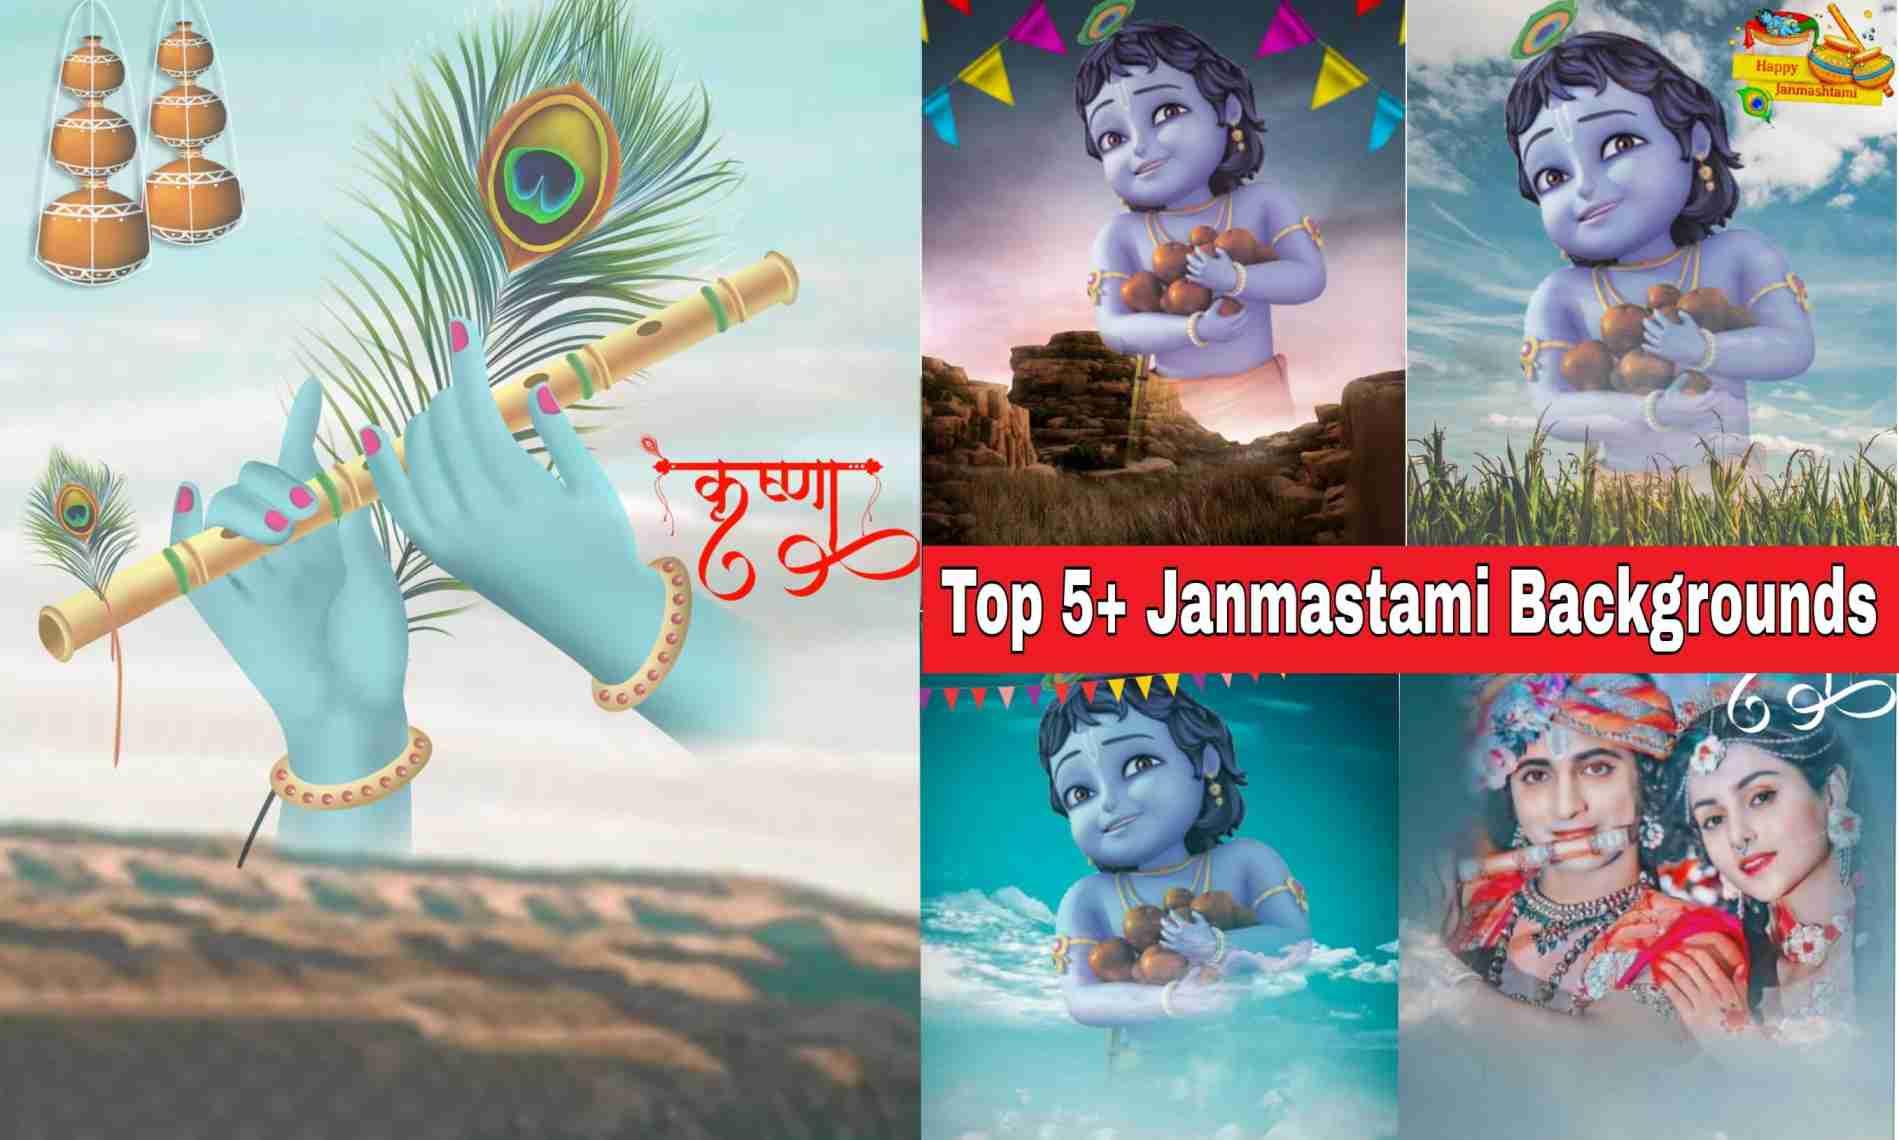 janmastami background for editing